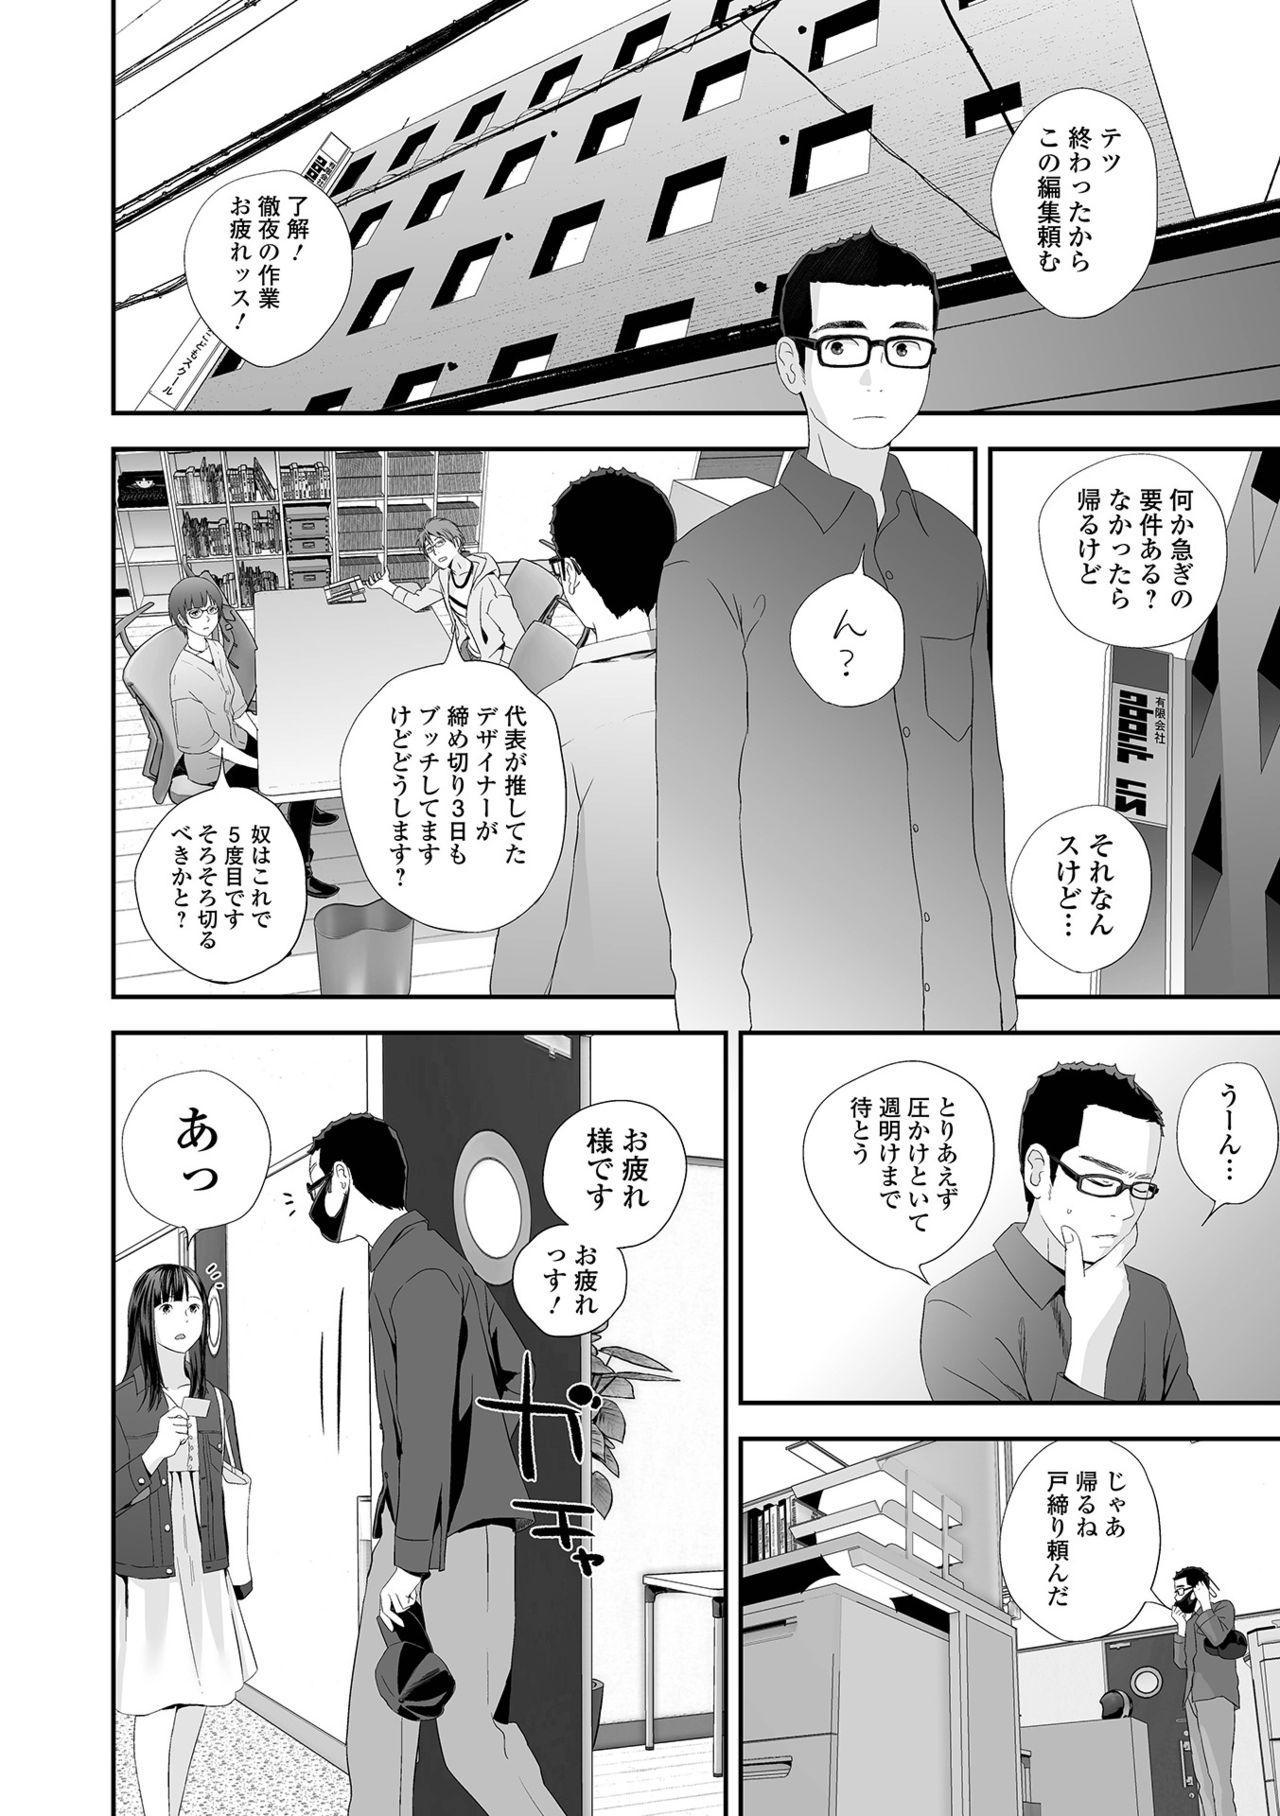 COMIC Shigekiteki SQUIRT!! Vol. 25 45